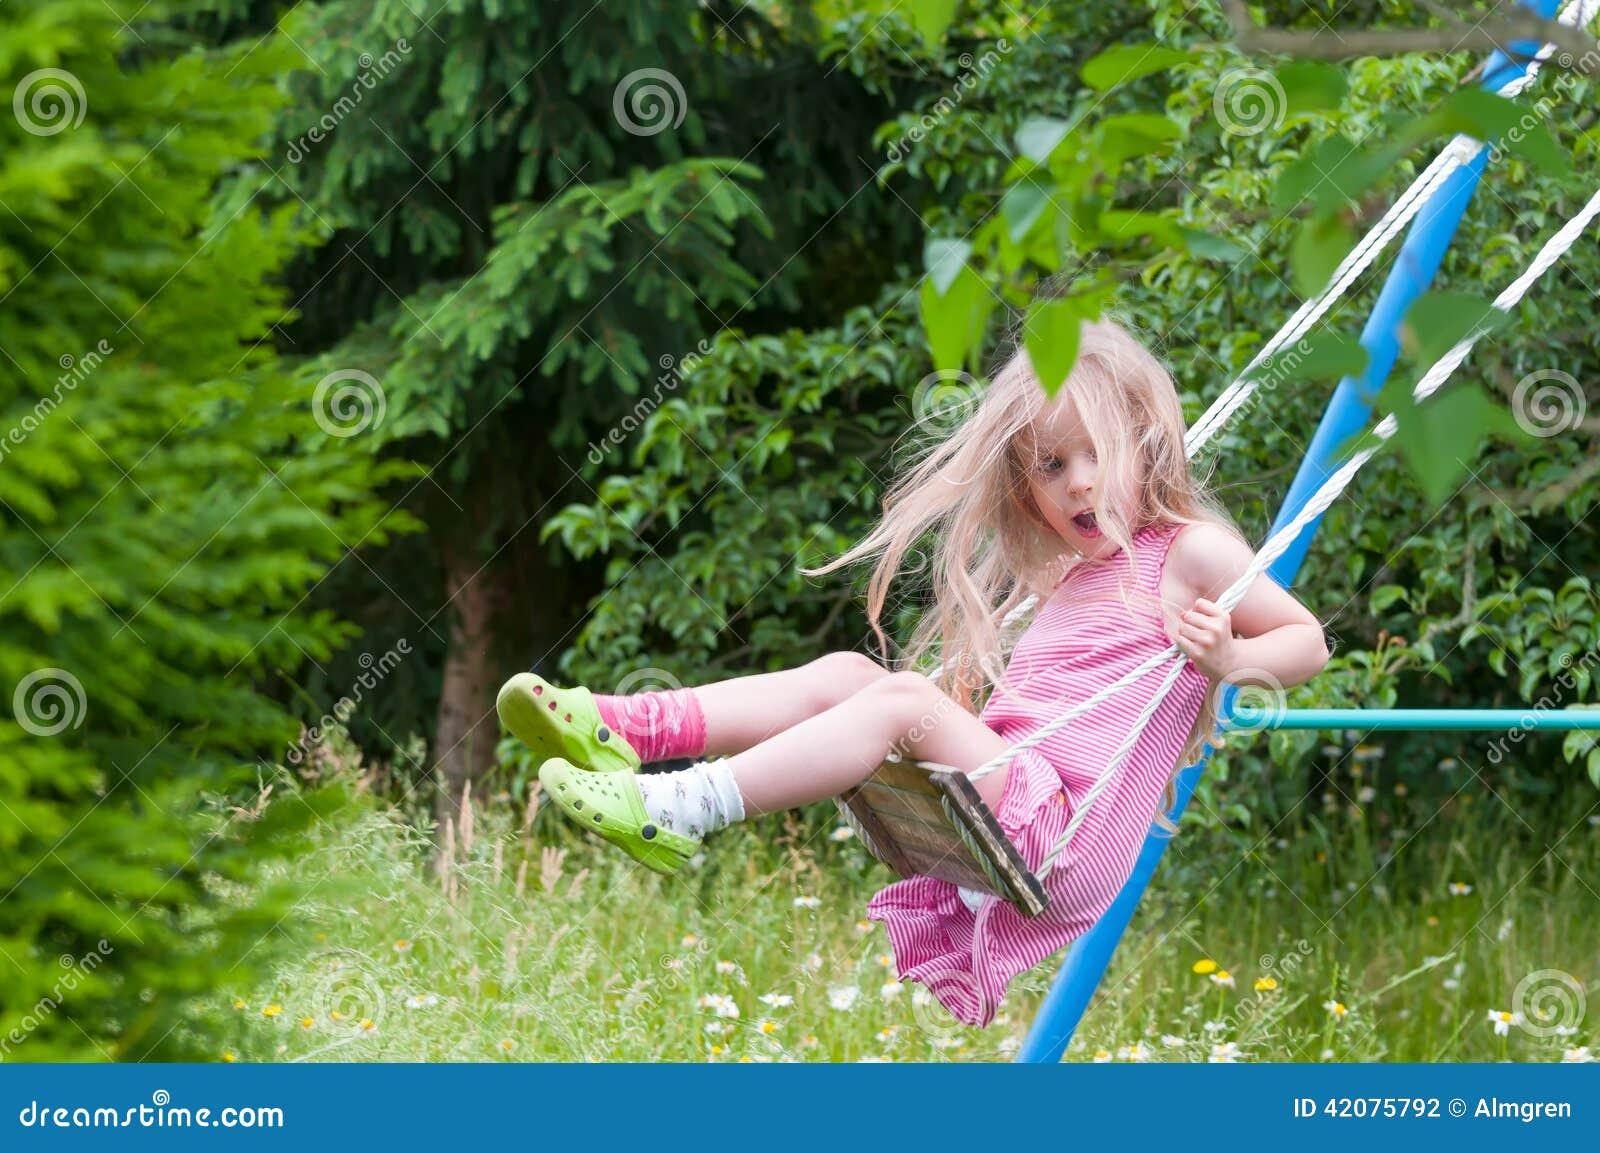 Teen on garden swing gets fucked 6